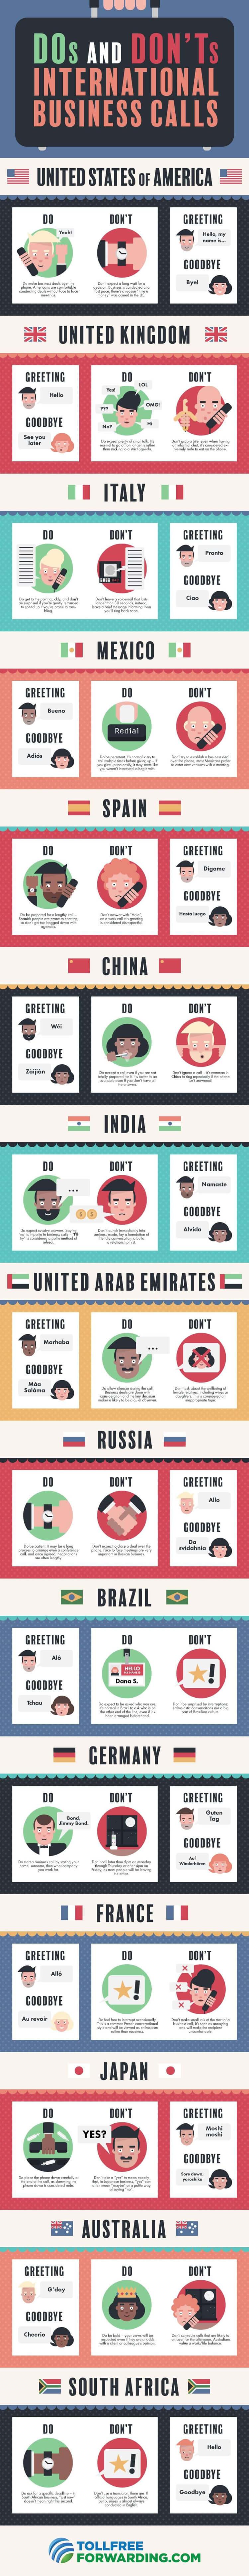 International Phone Etiquette Infographic